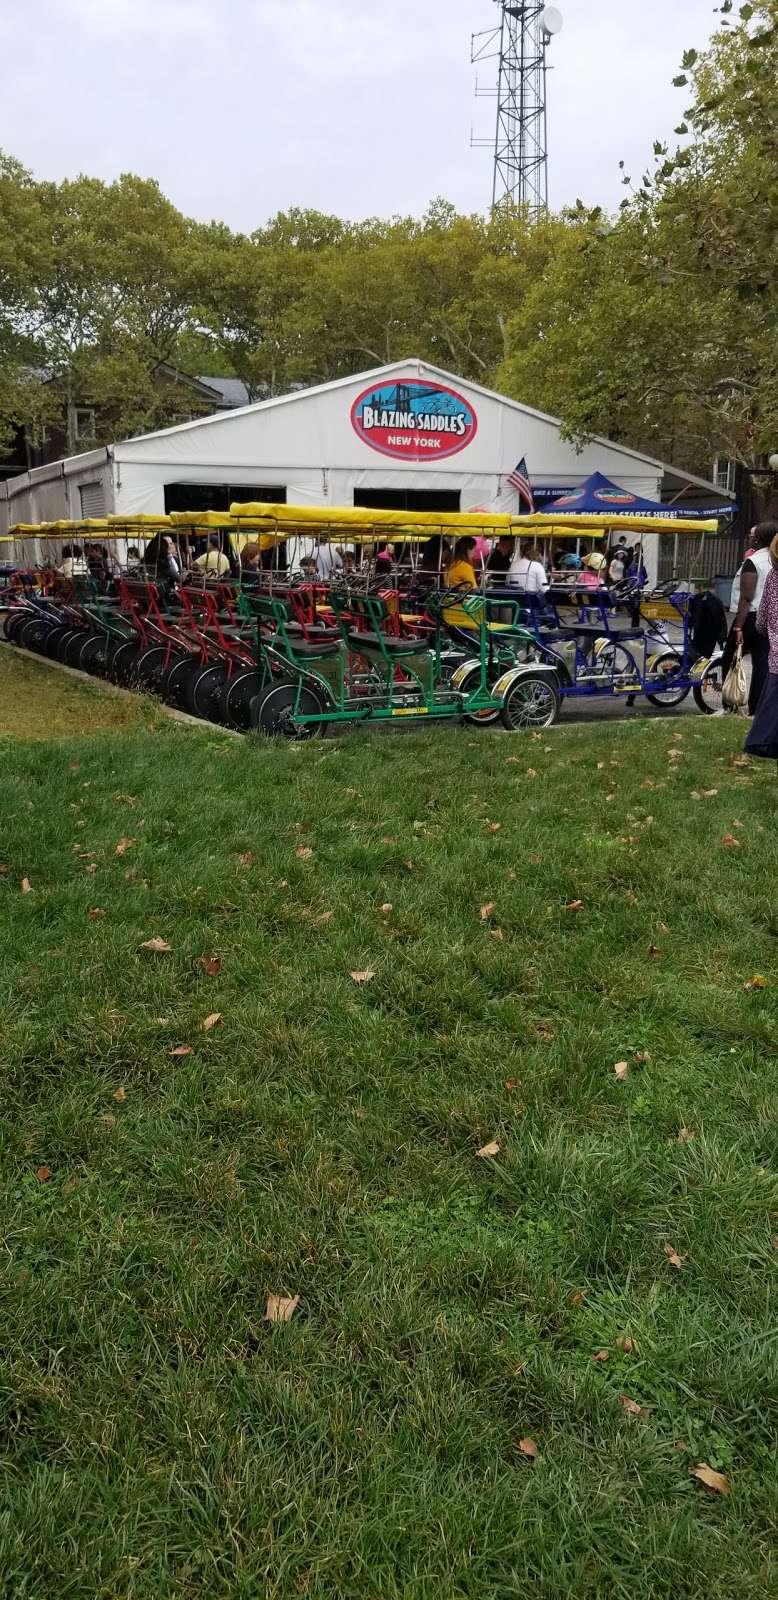 Blazing Saddles Bike Rentals & Tours - travel agency  | Photo 8 of 9 | Address: 698 Division Rd, New York, NY 10004, USA | Phone: (917) 440-9094